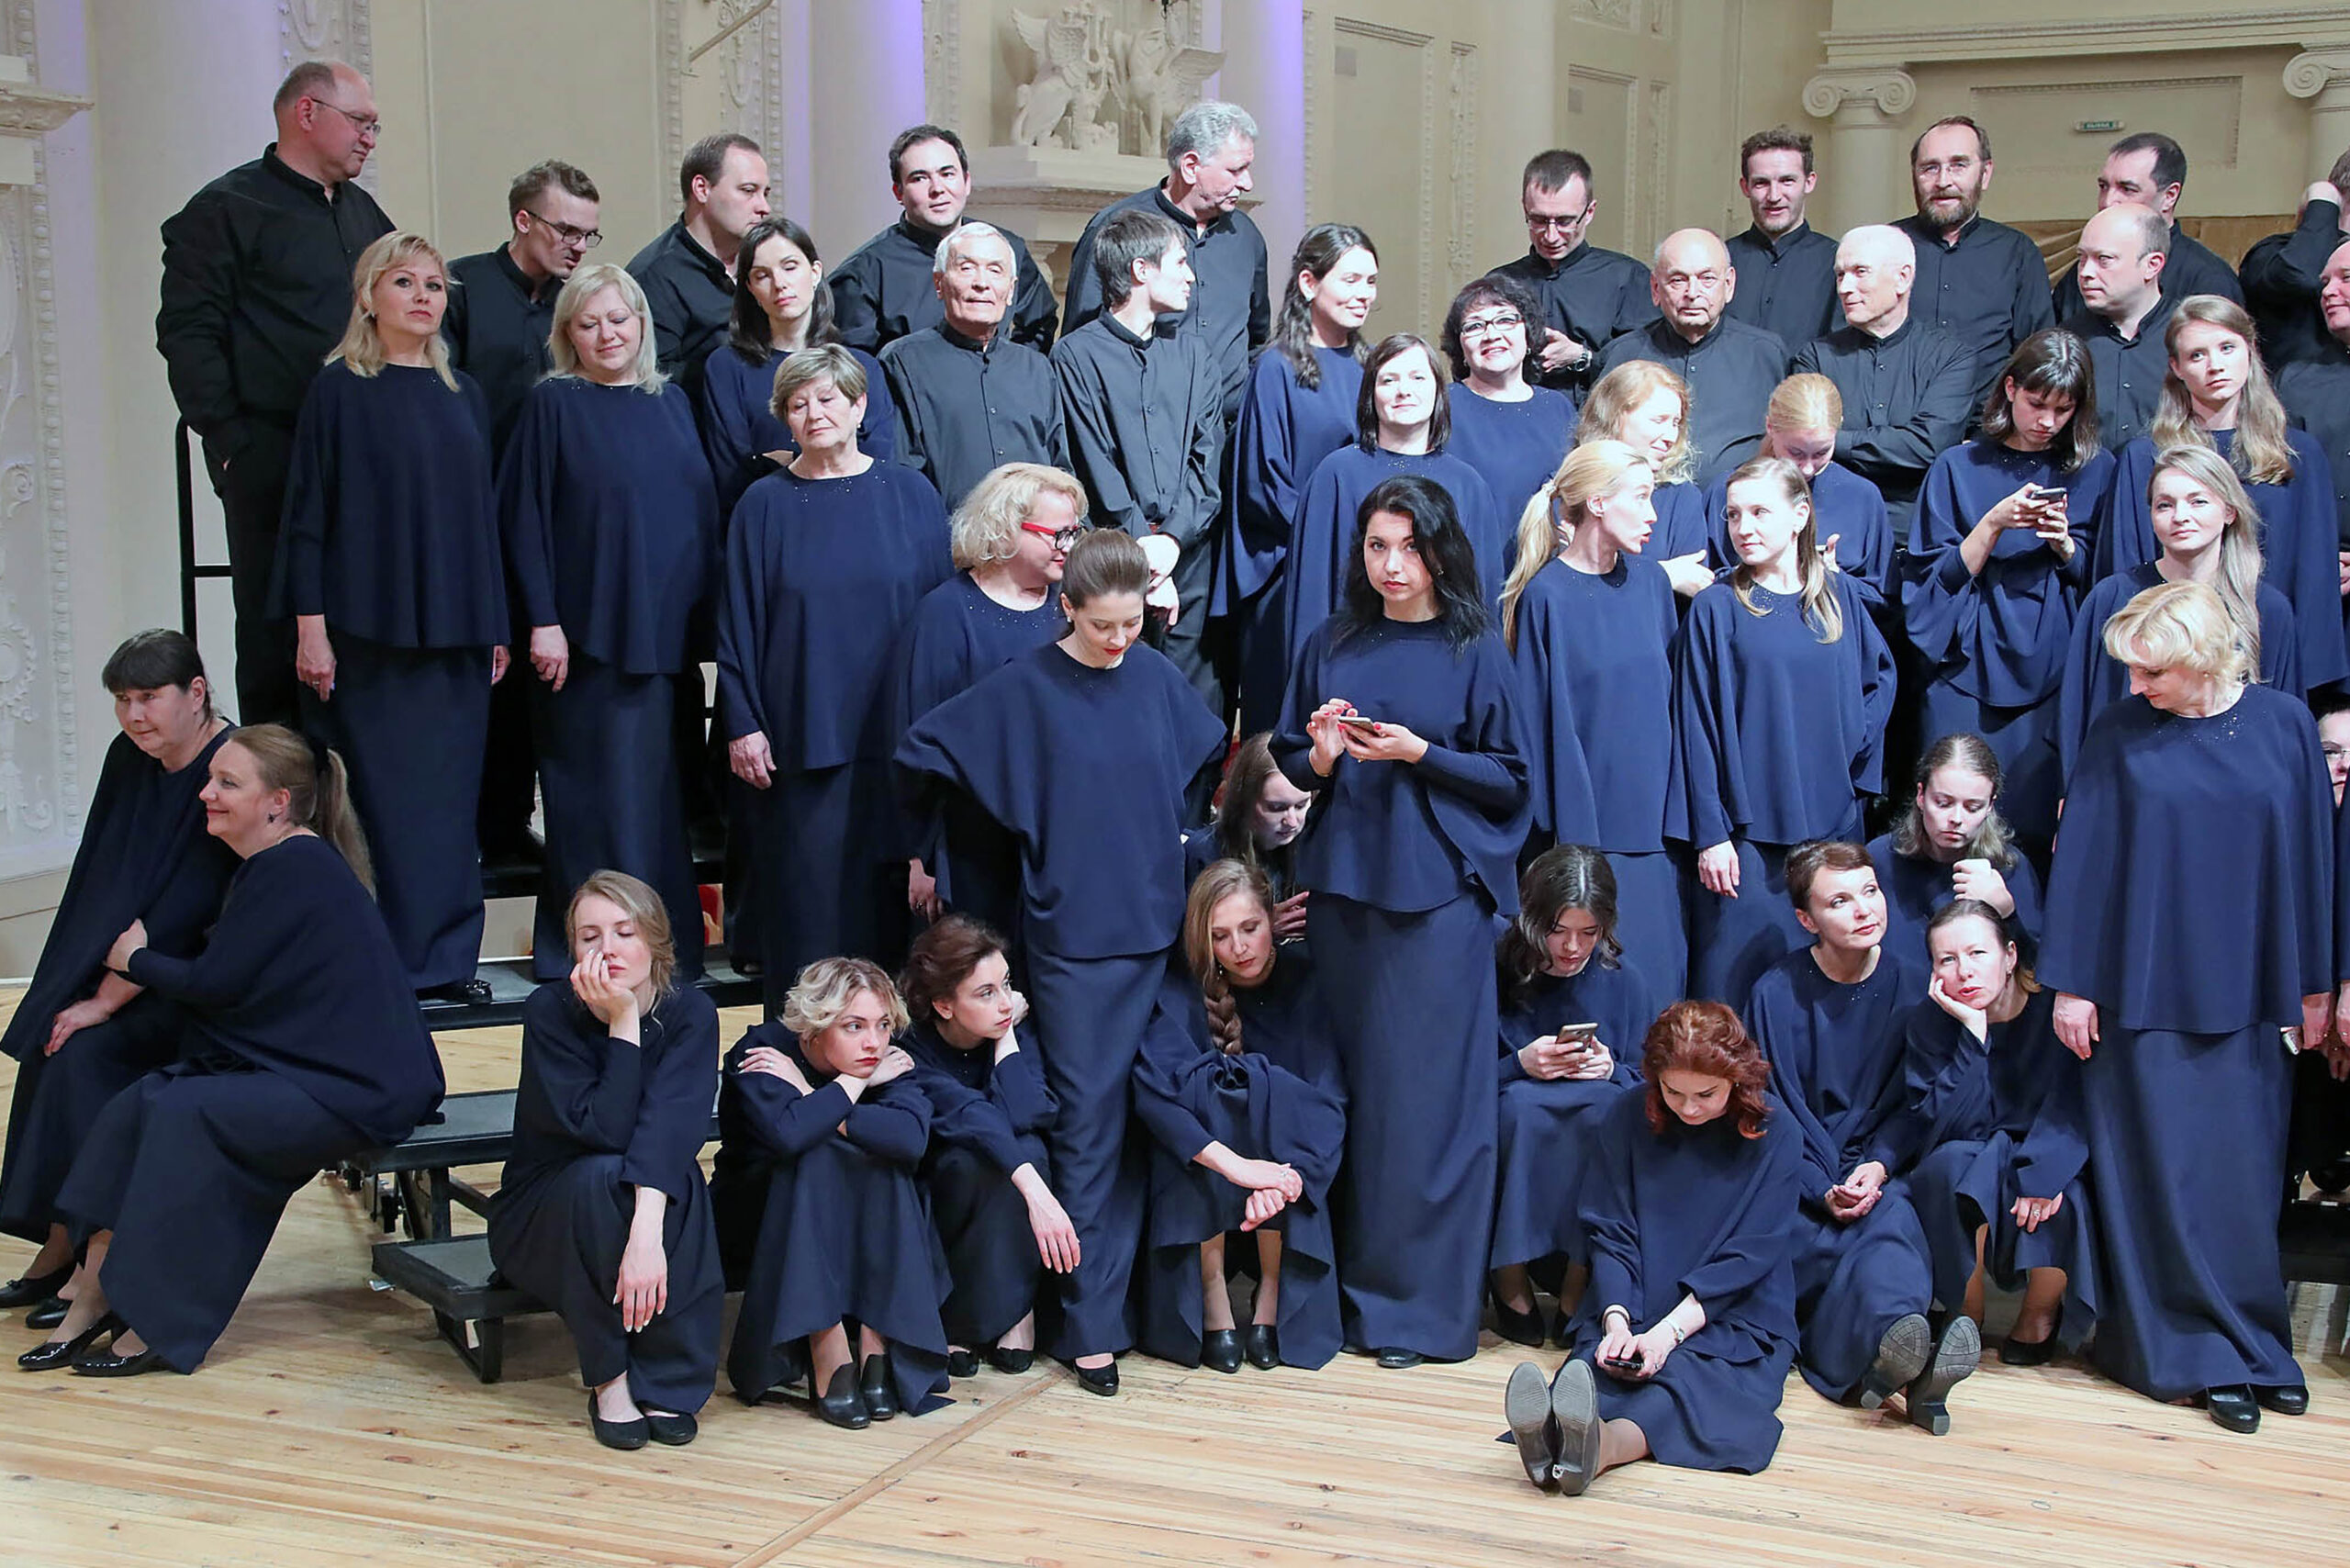 Tatiana Andreyeva, Rusija/Russia: Tough Photo Shoot, 2019, Yekaterinburg Amateur Choir, Russia